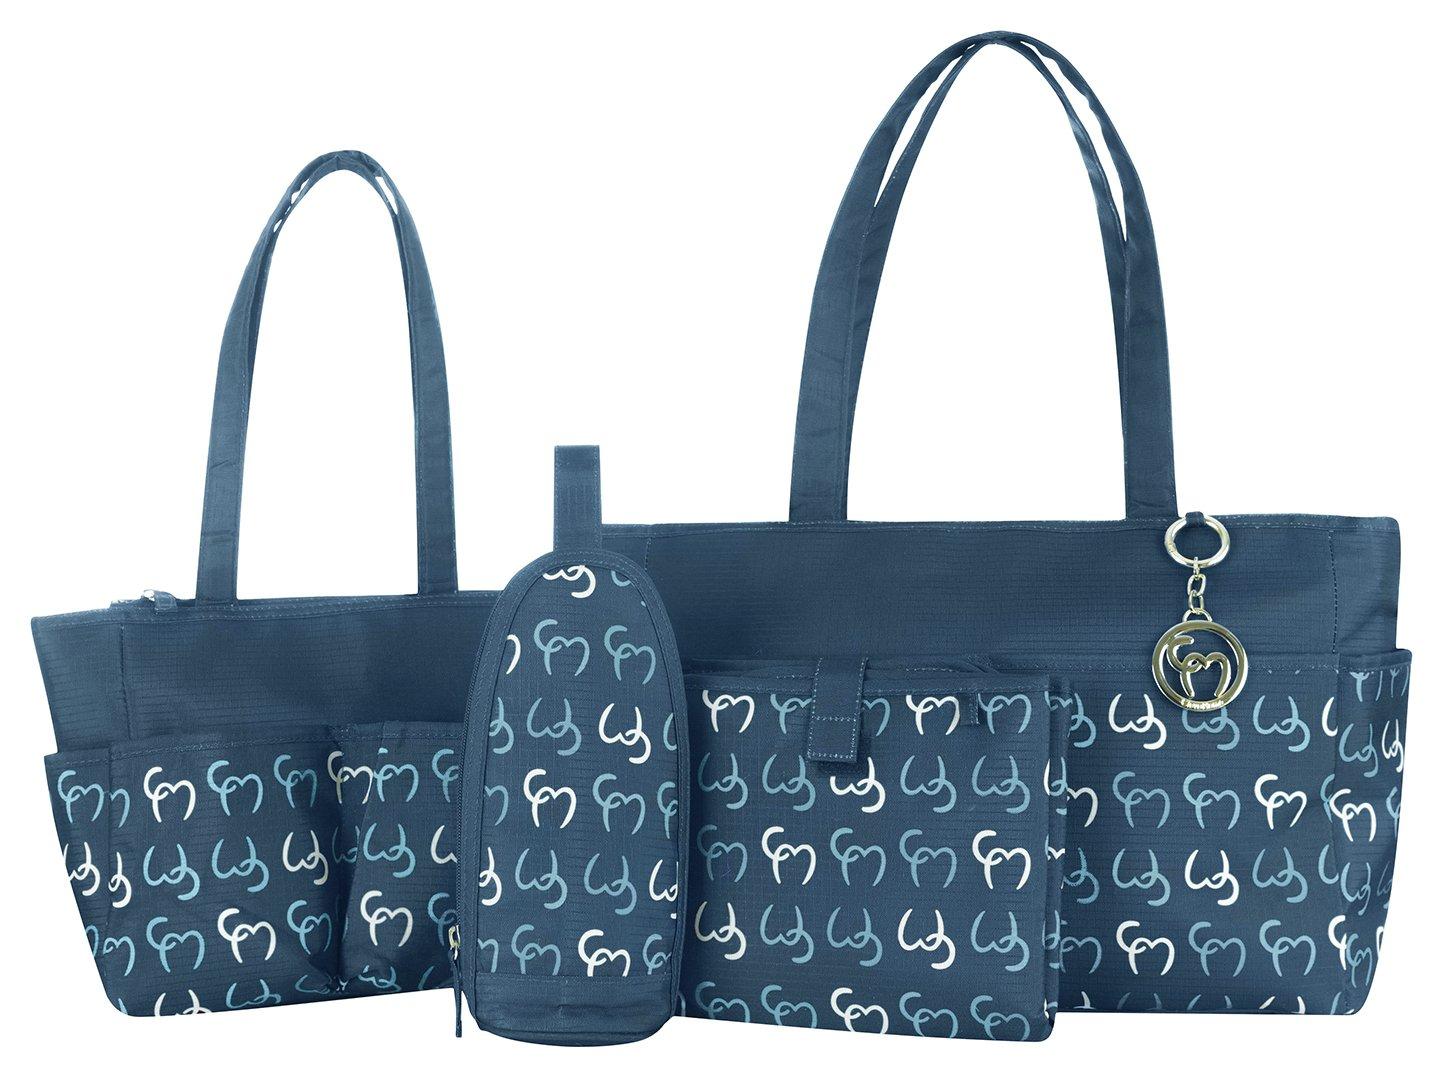 Clevamama Nicole Tote Bag - Navy.